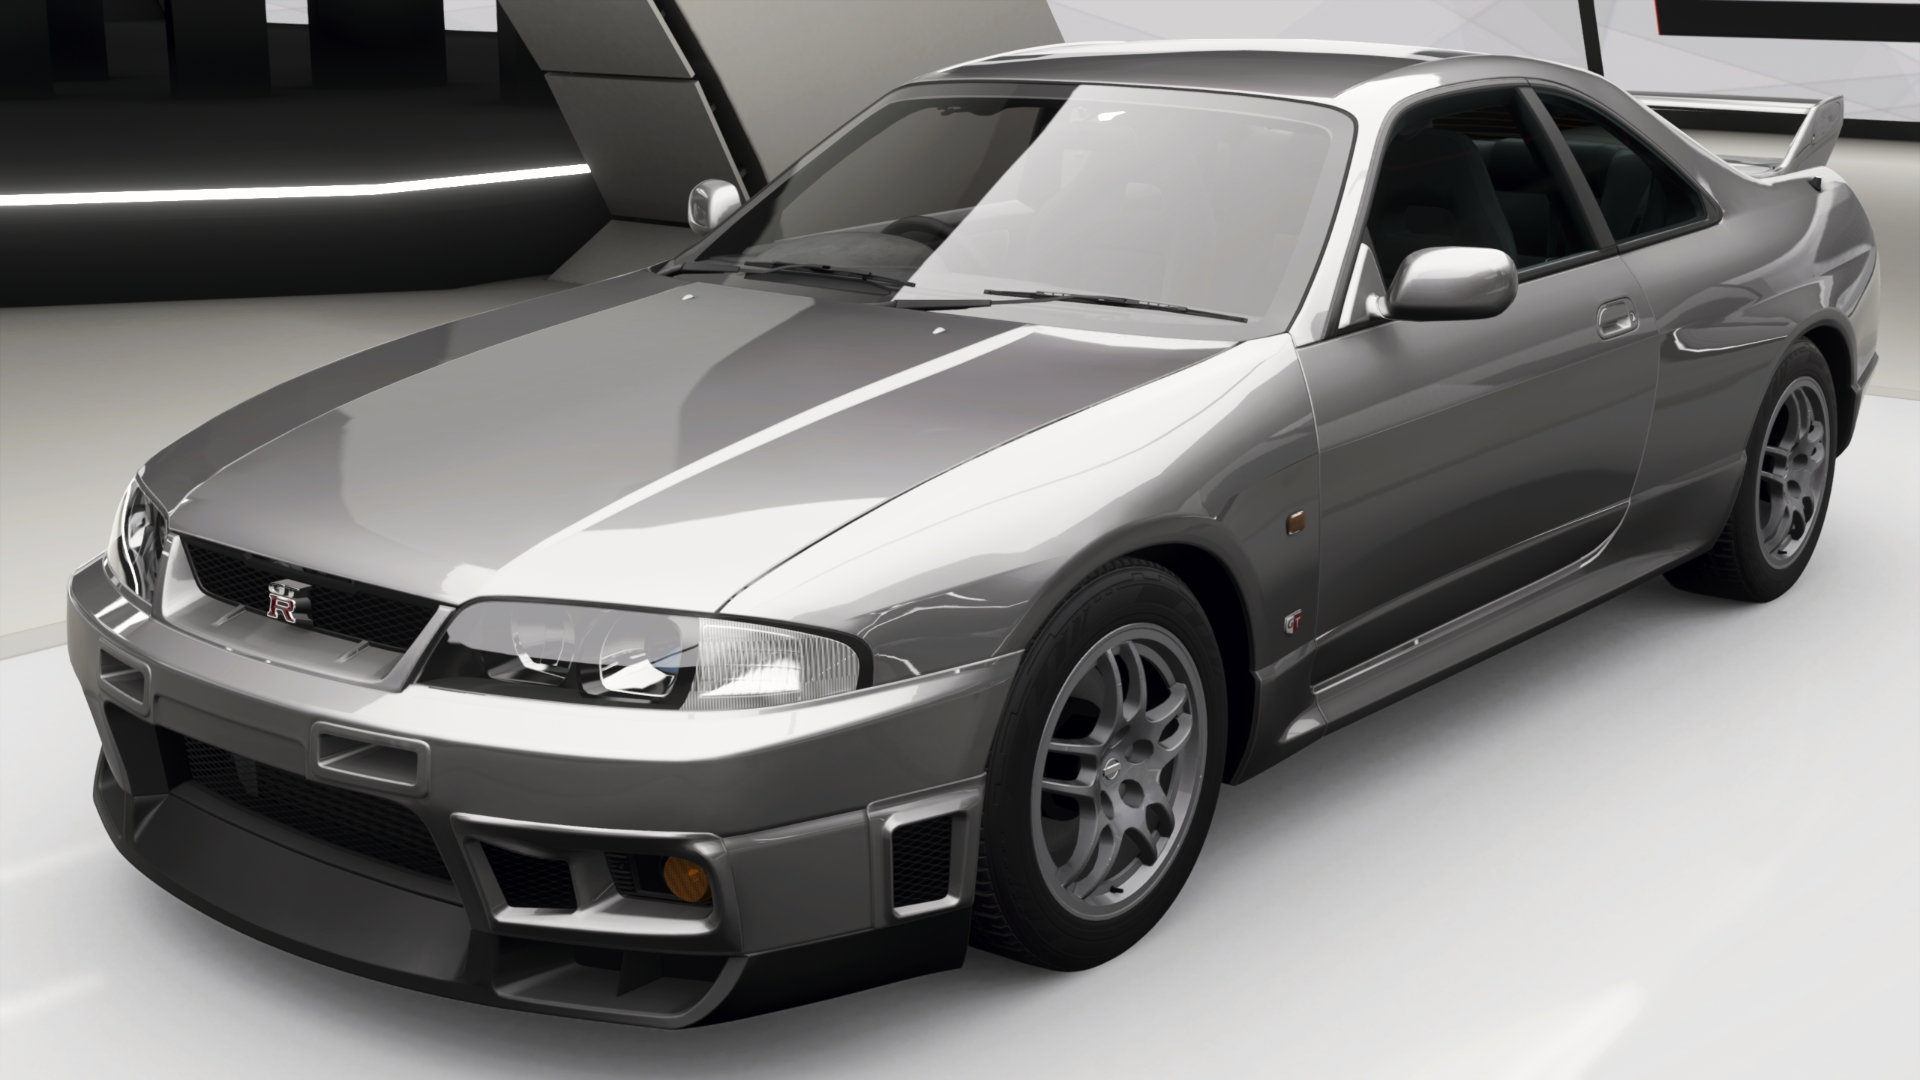 Nissan Skyline GT-R V-Spec (1997) | Forza Motorsport Wiki